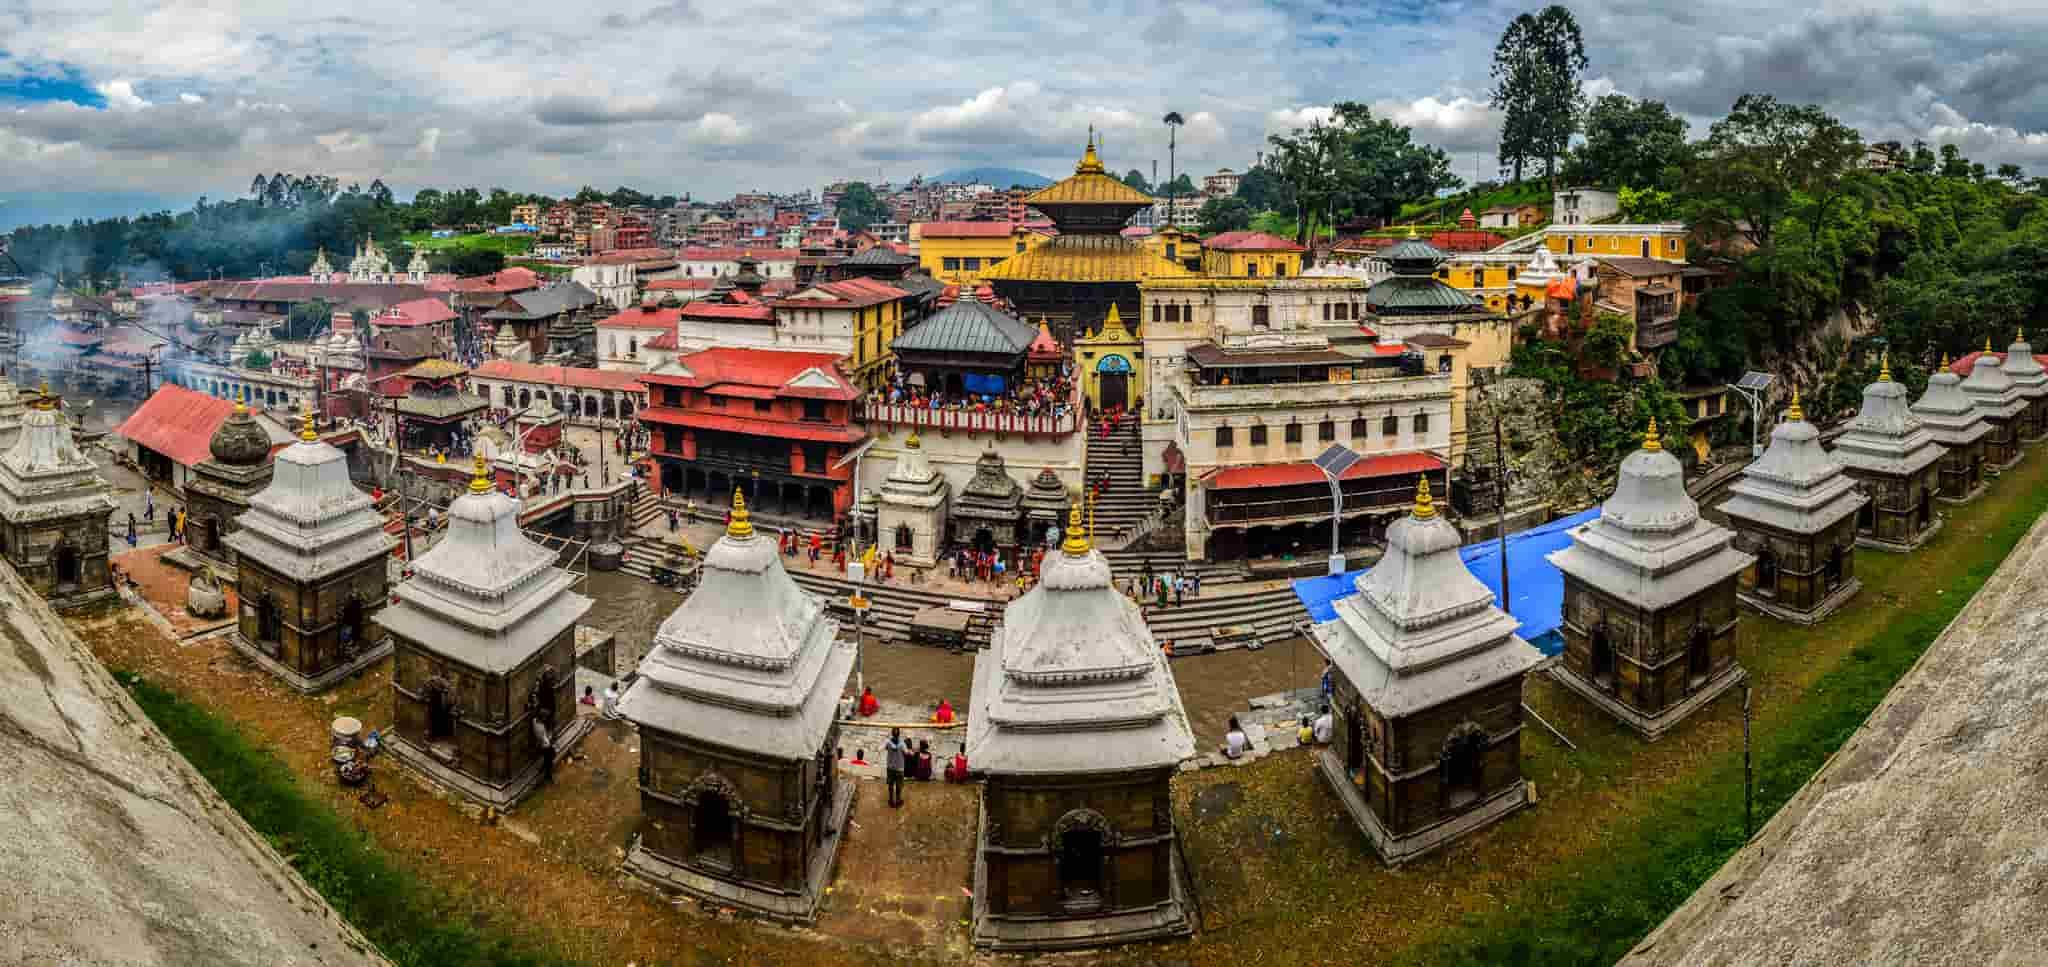 Nepal Temple Tour | Kesari's All Inclusive Nepal Tour Package